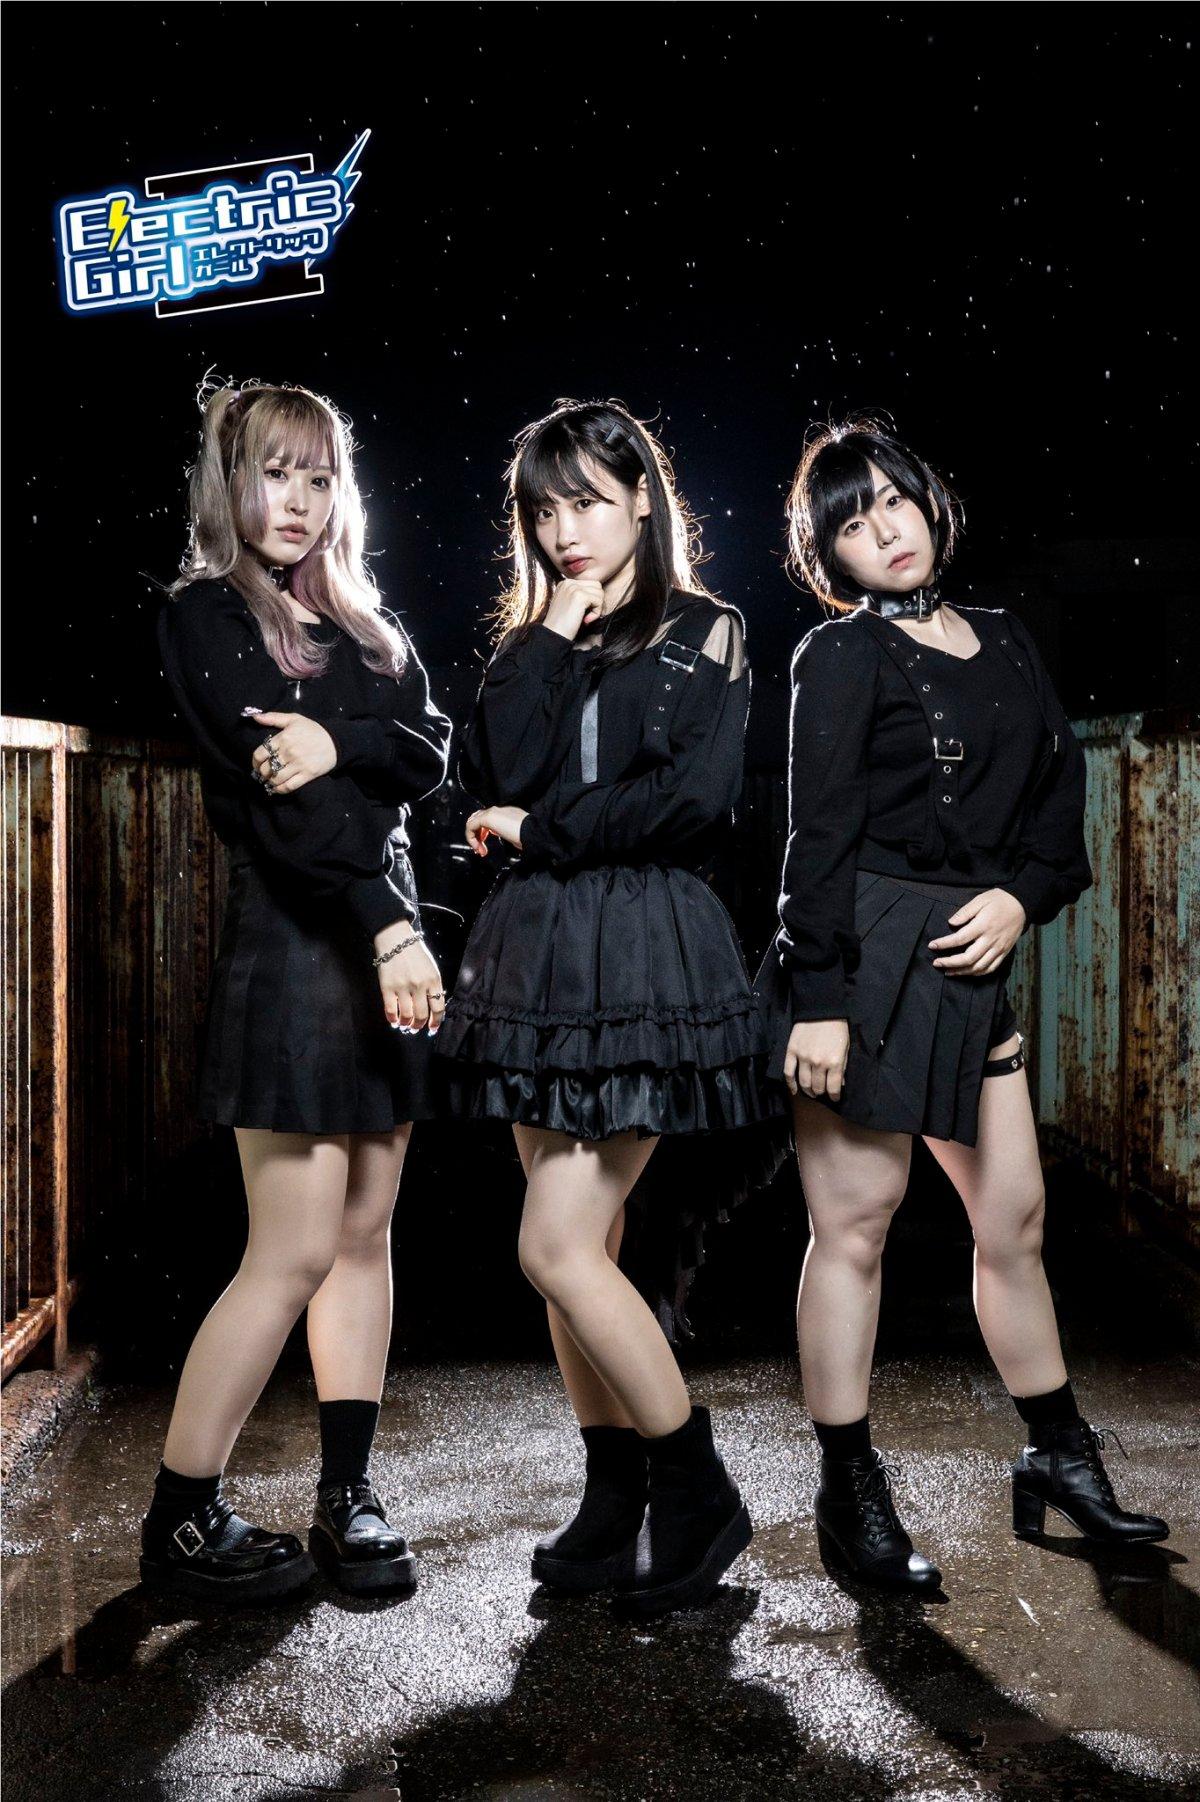 ElectricGirlⅢ